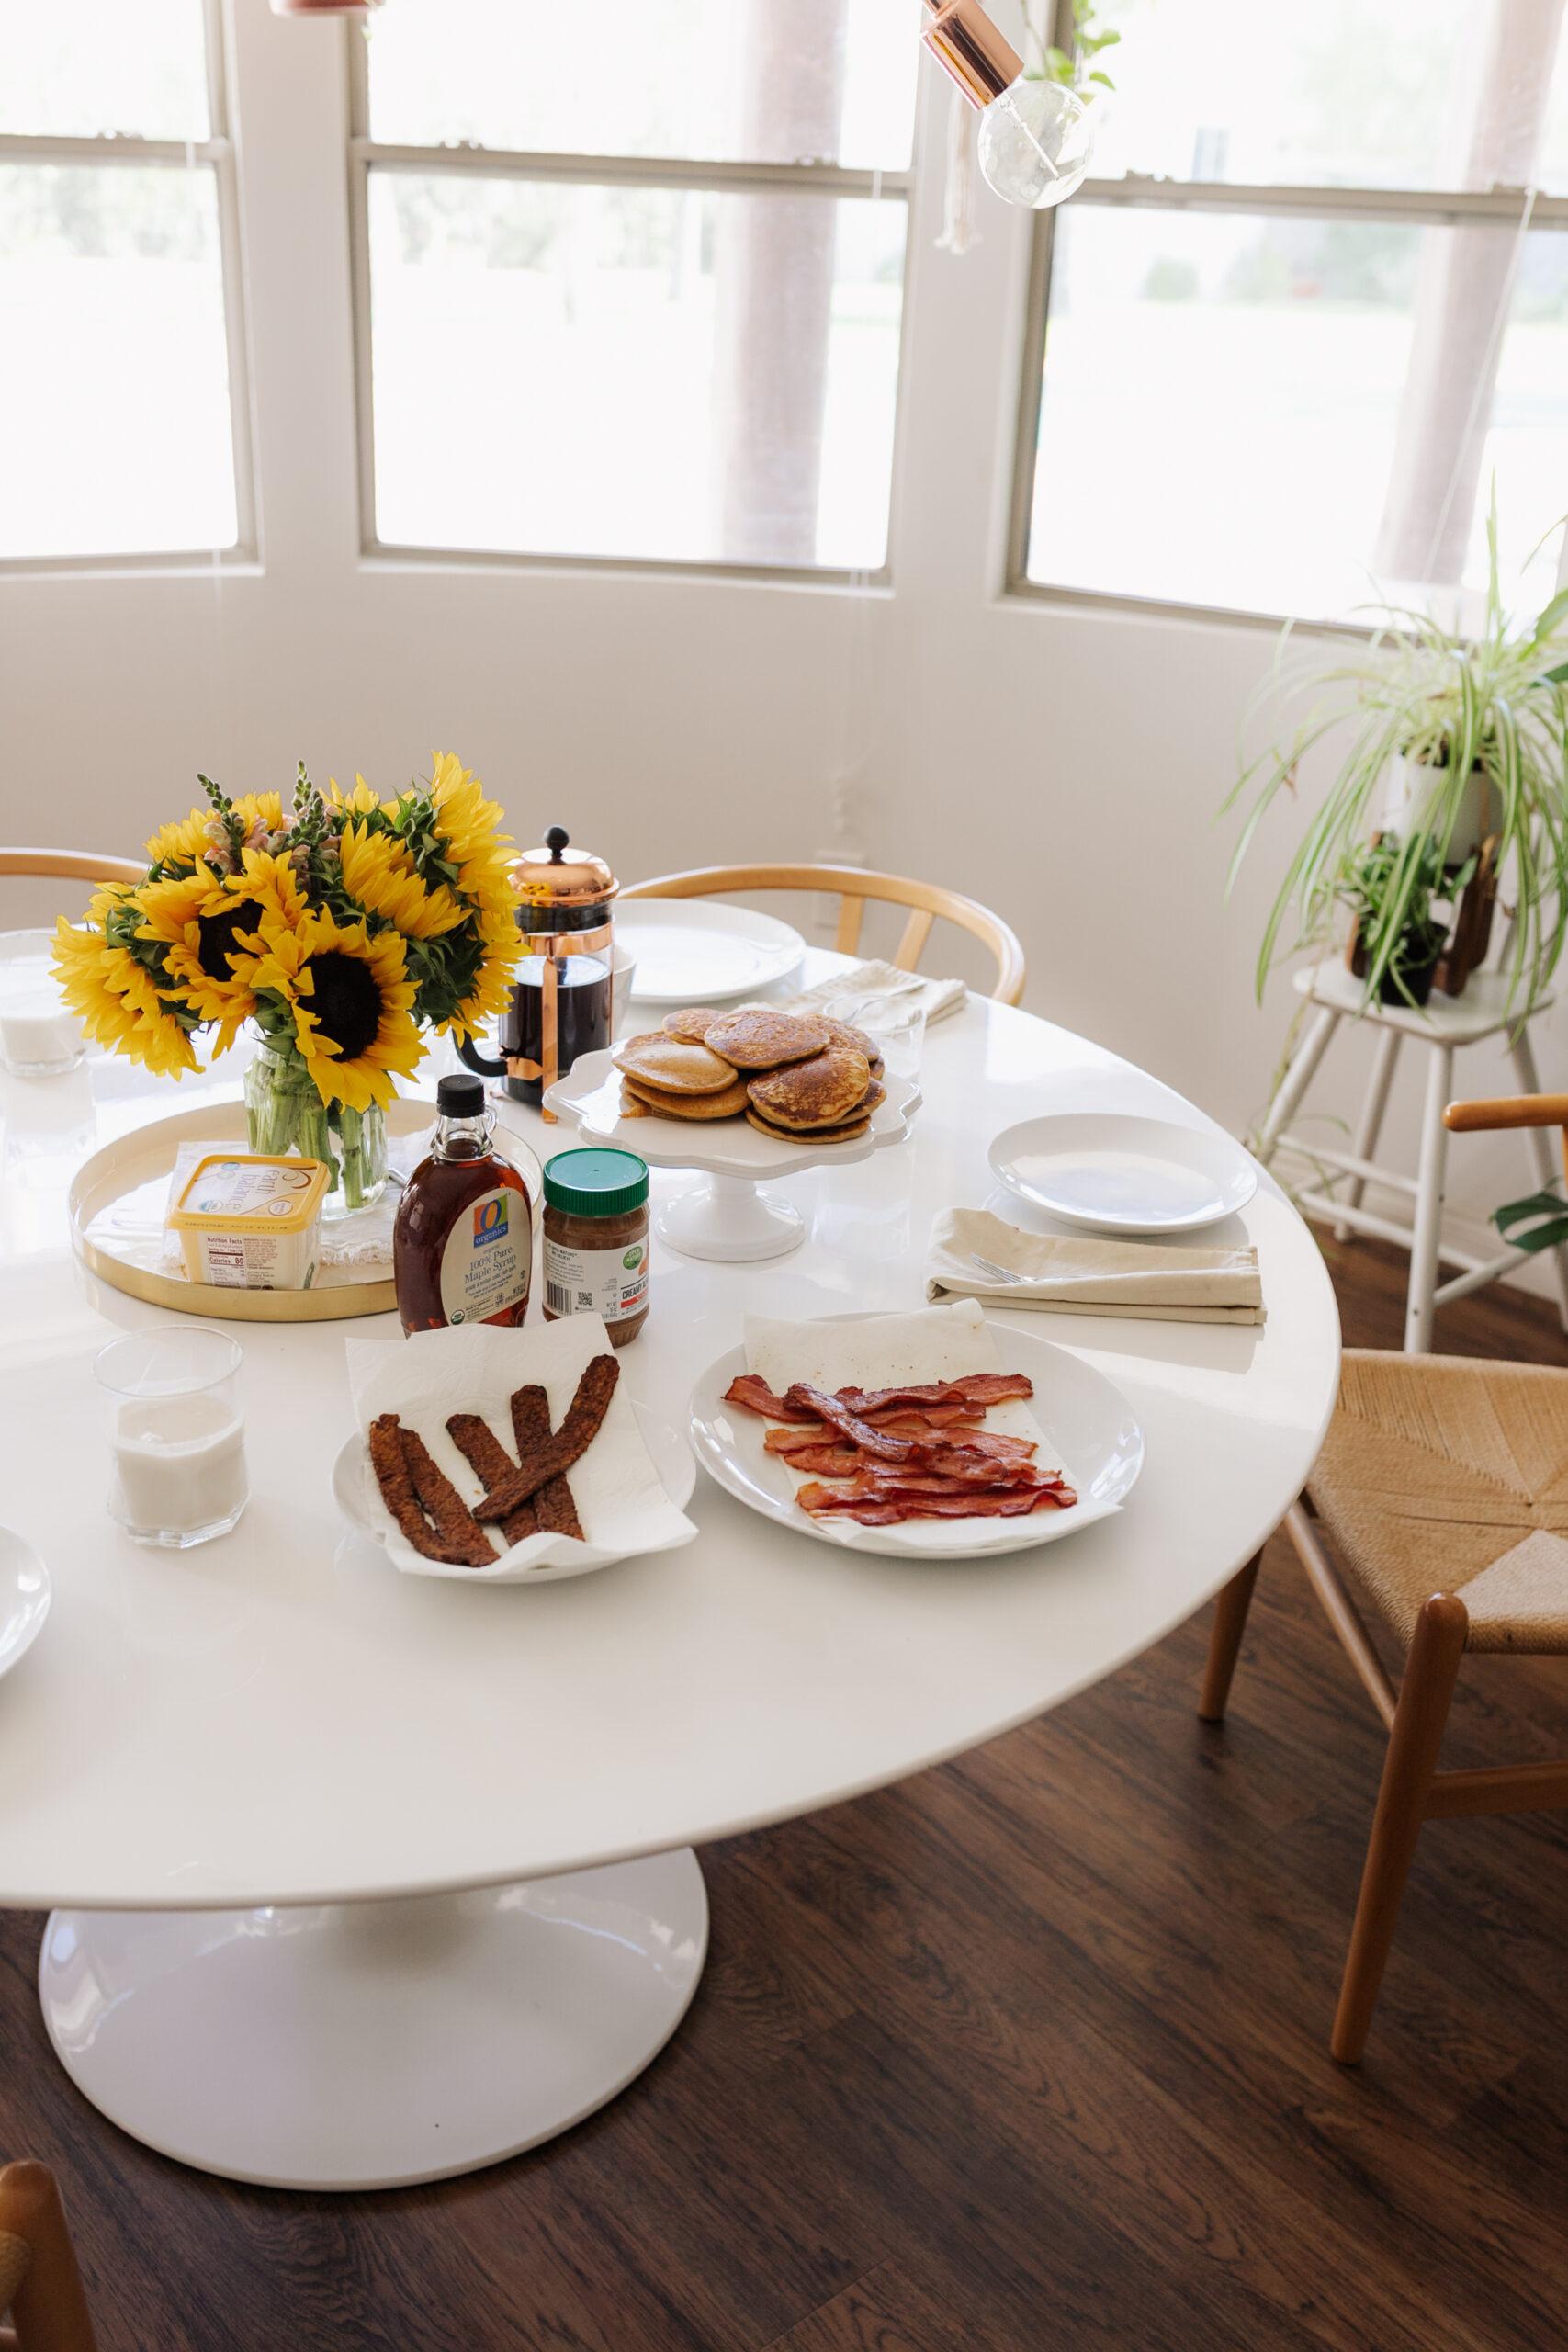 our sunday morning fall breakfast spread! #pumpkinspicepancakes #veganbacon #coffee #dairyfree #glutenfree